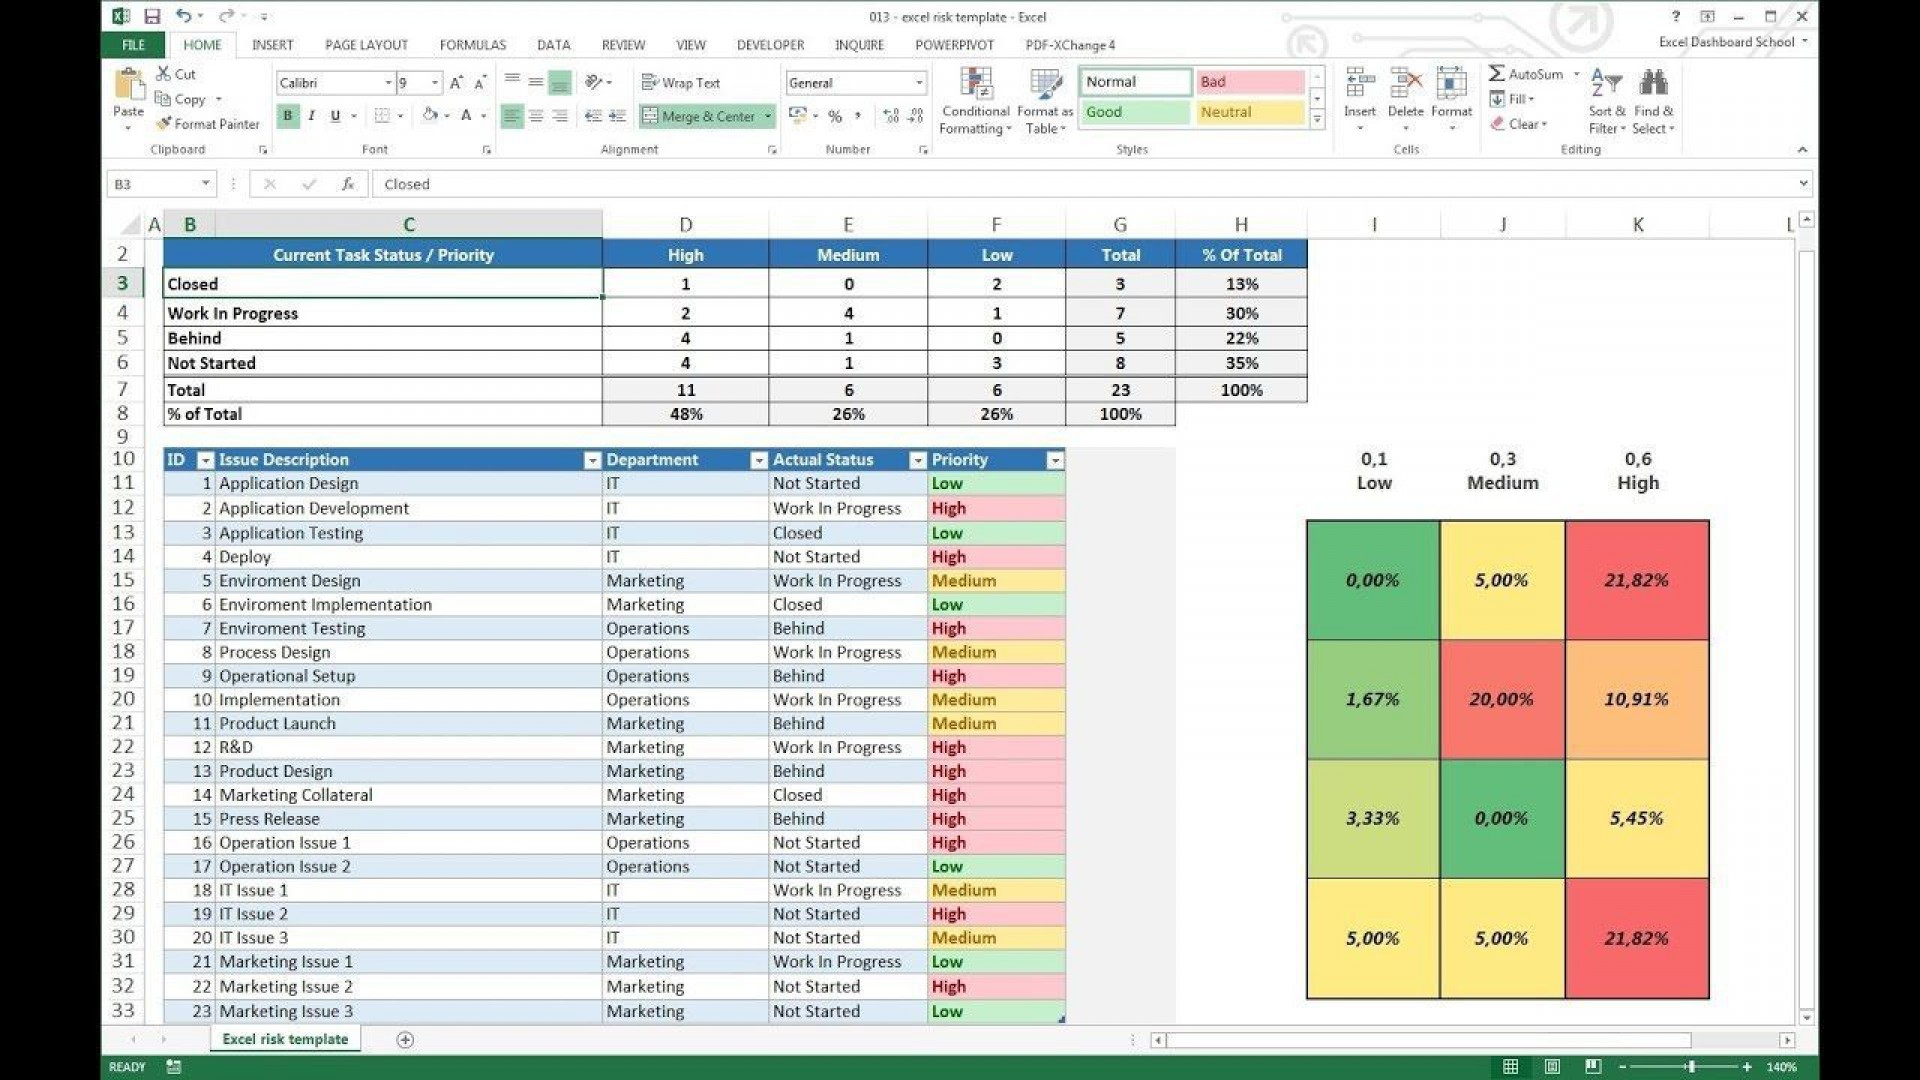 005 Impressive Software Project Management Excel Template Free Idea 1920